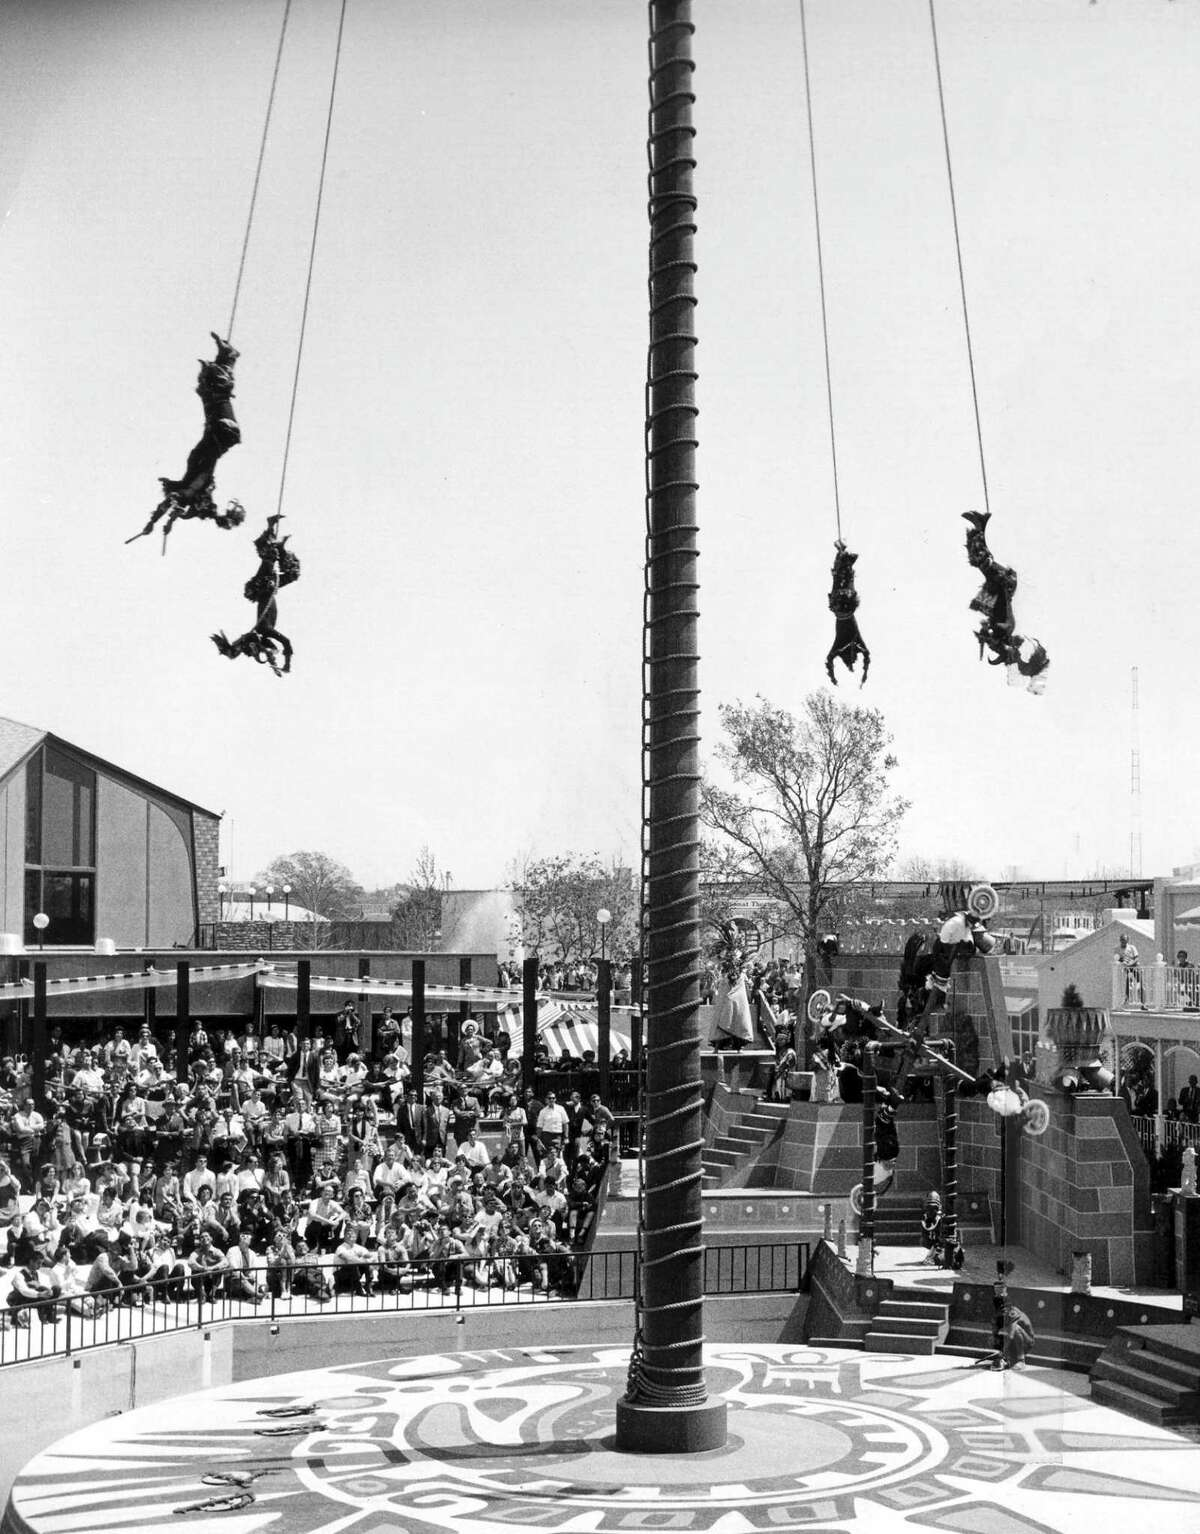 LOS VOLADORES DE PAPANTLA the flying Indians.Hemisfair S.A. Worlds Fair 1968 Credit:Zintgraff Photographers